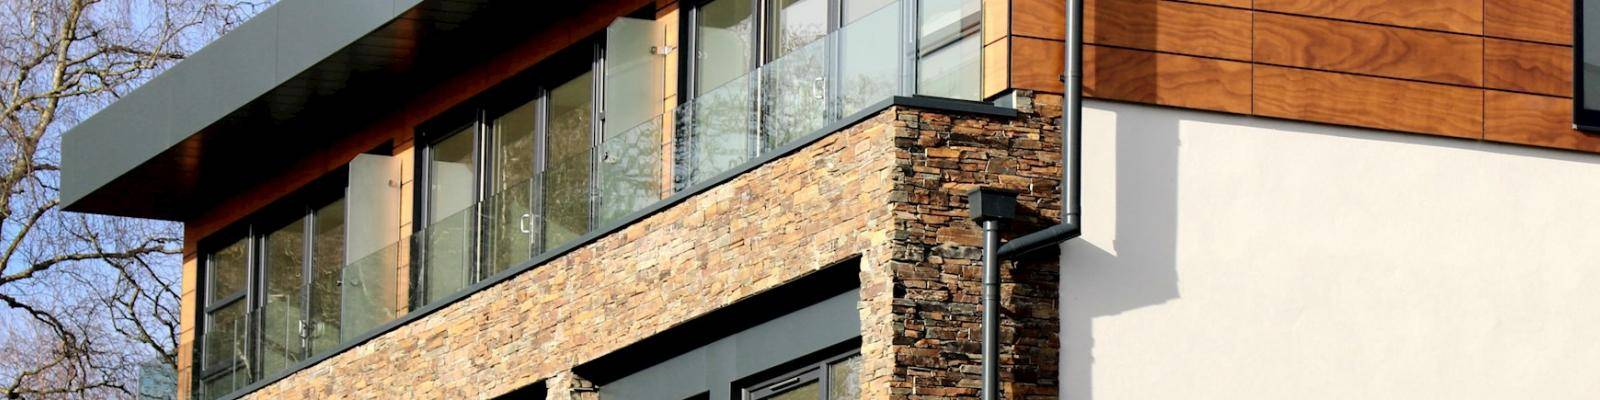 gevel huis met balkon